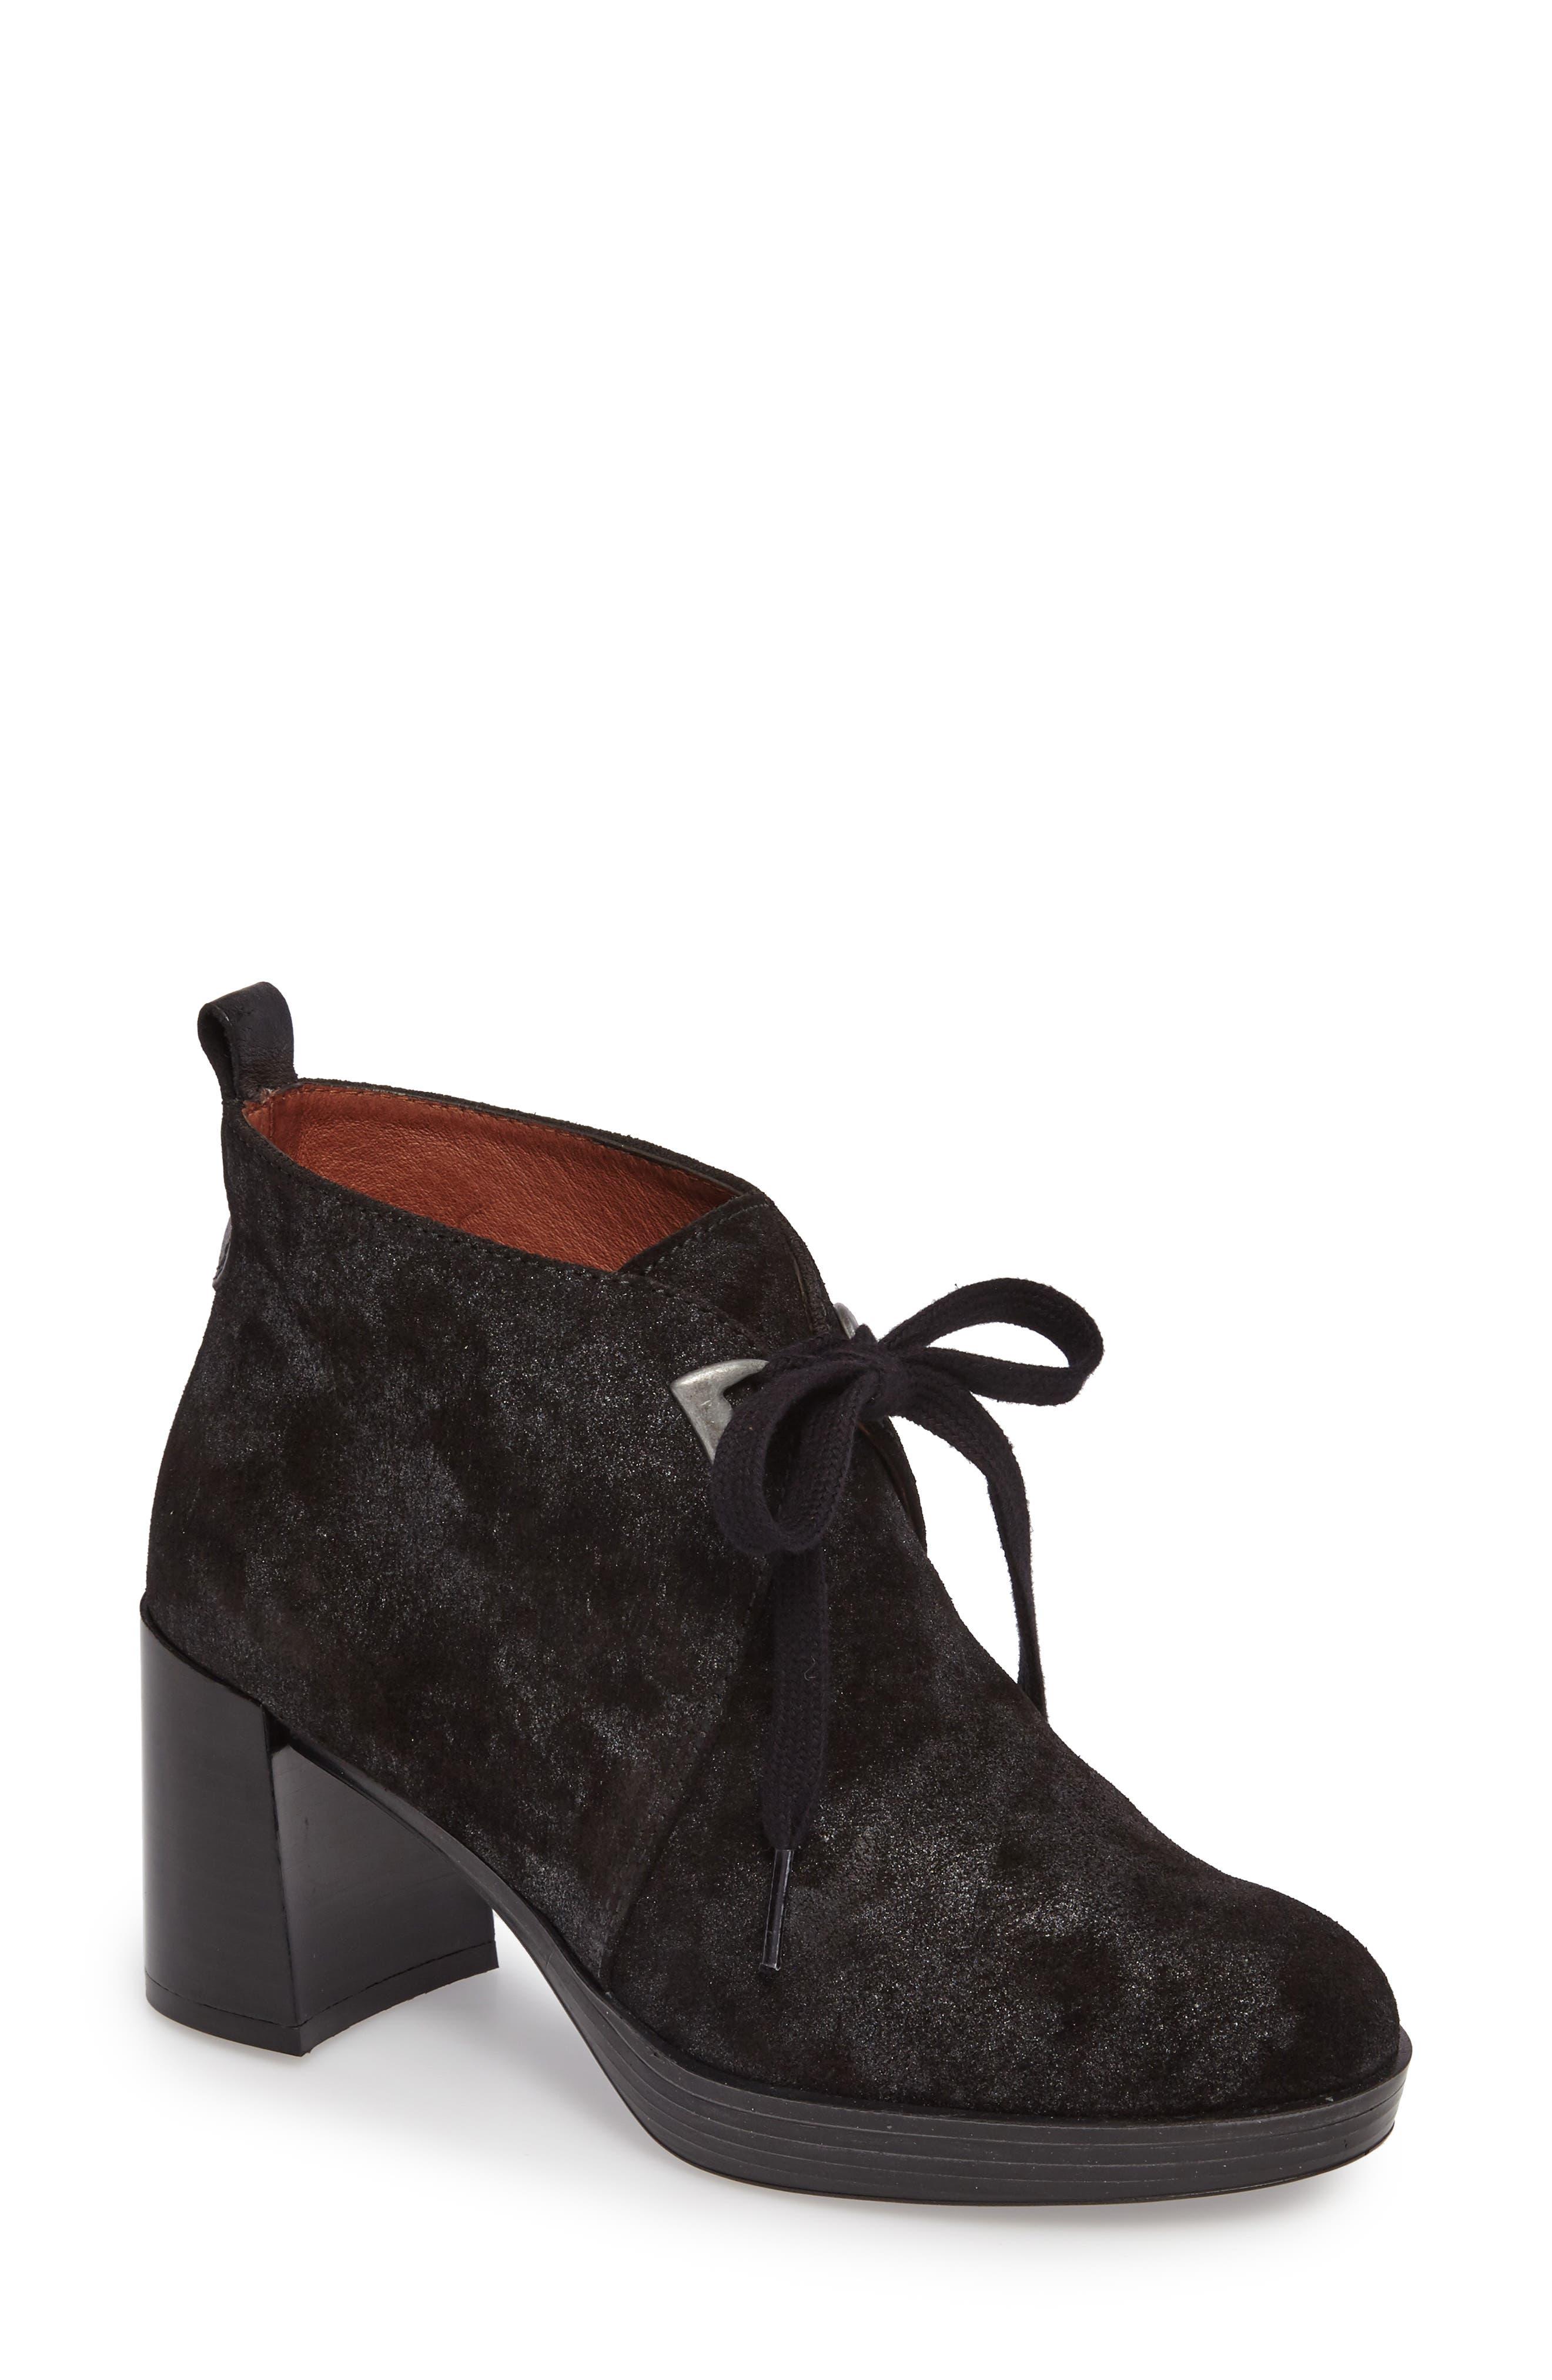 Dasia Bow Bootie,                         Main,                         color, Brut Black Leather